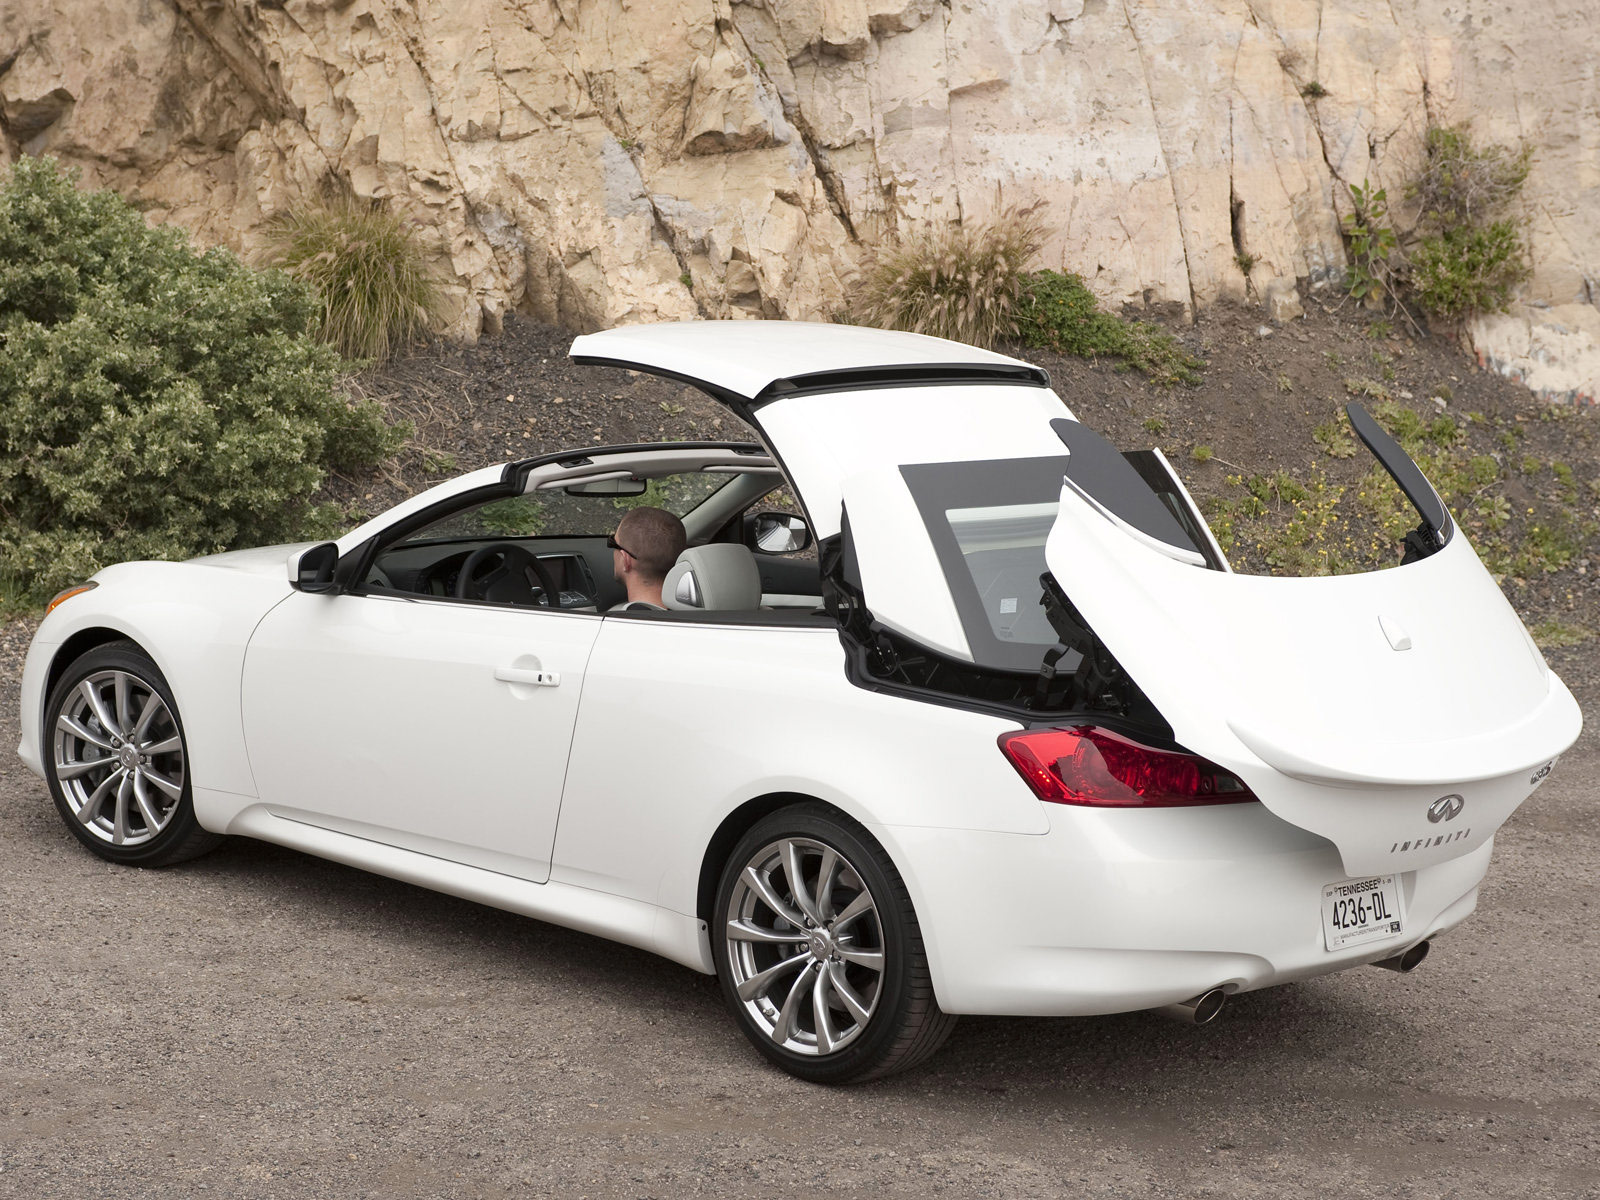 g37 infiniti convertible 2009 modified power accident vehicle lawyers avtolog источник